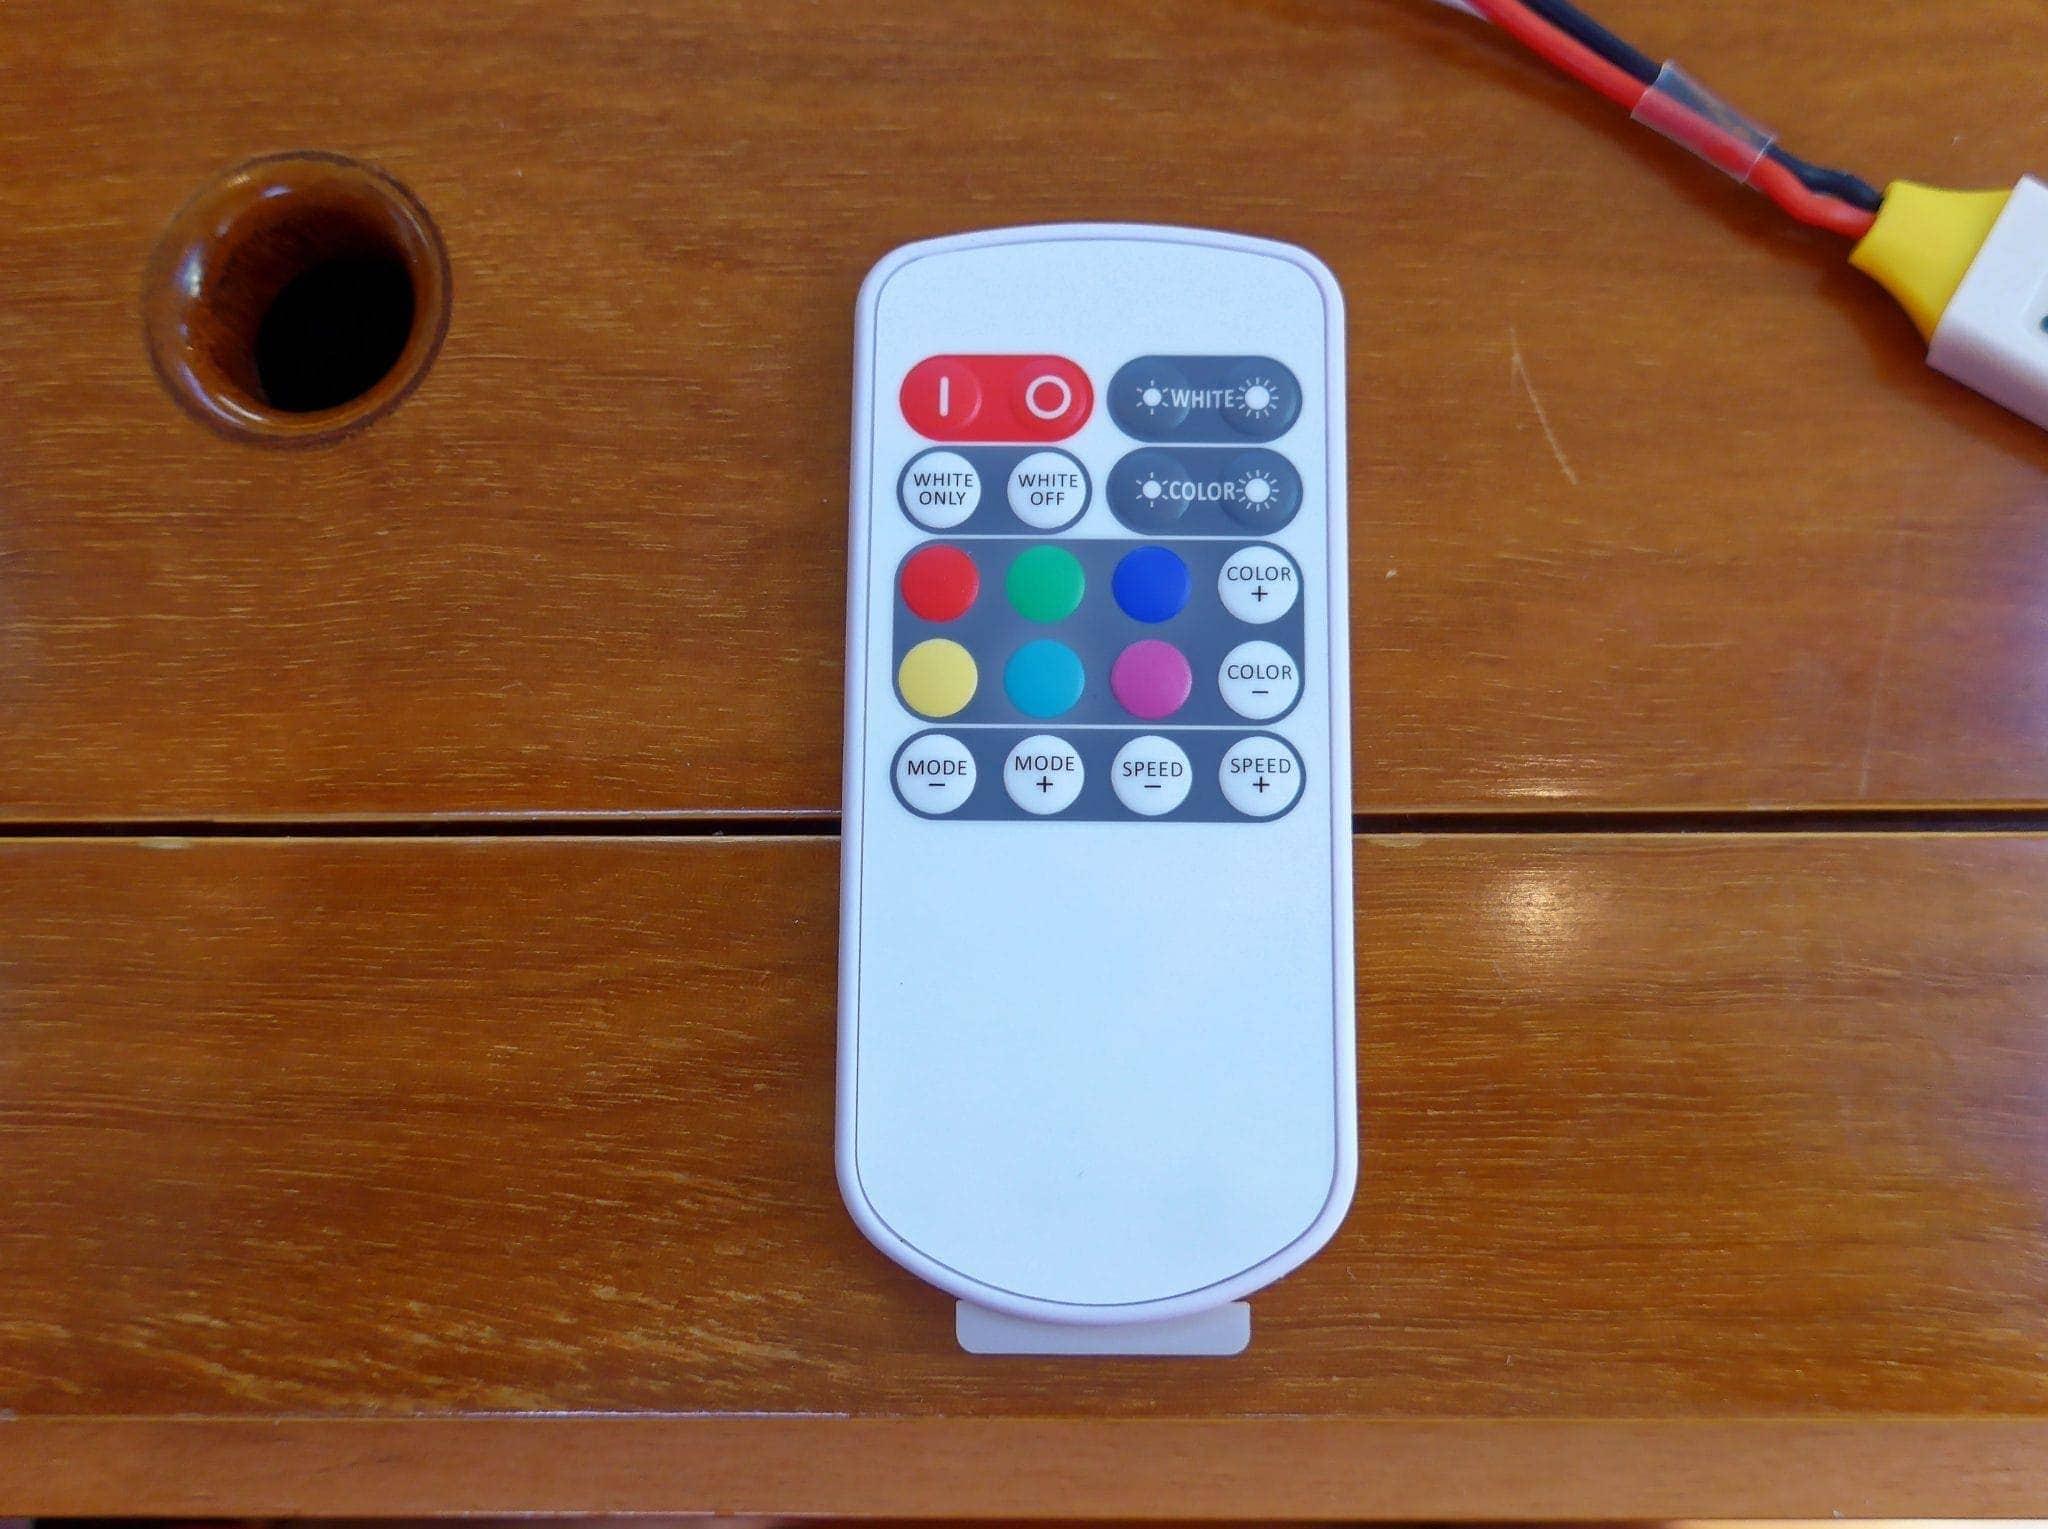 Controller remote